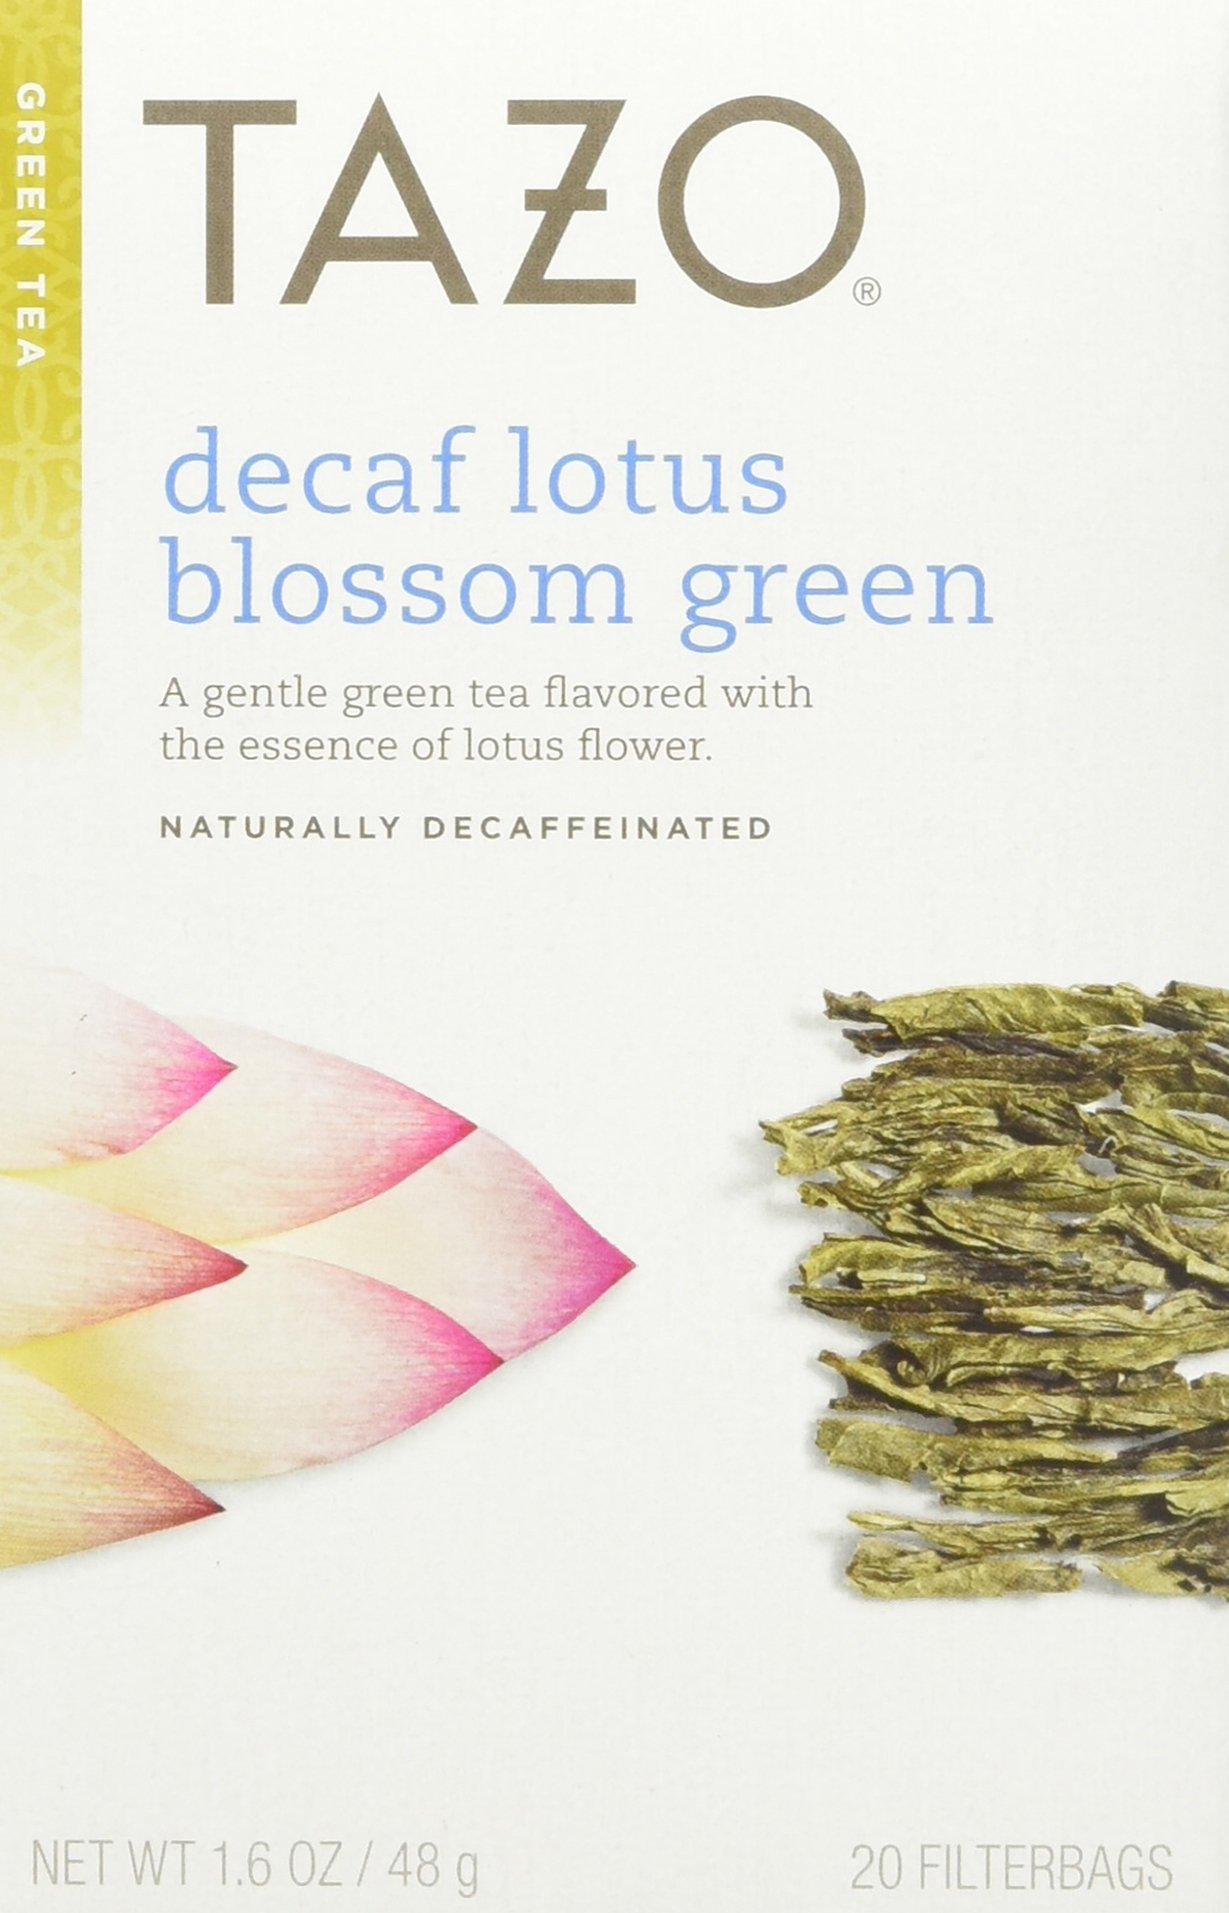 Tazo Decaf Lotus Blossom Green Tea, 20 Bag (Pack of 6)